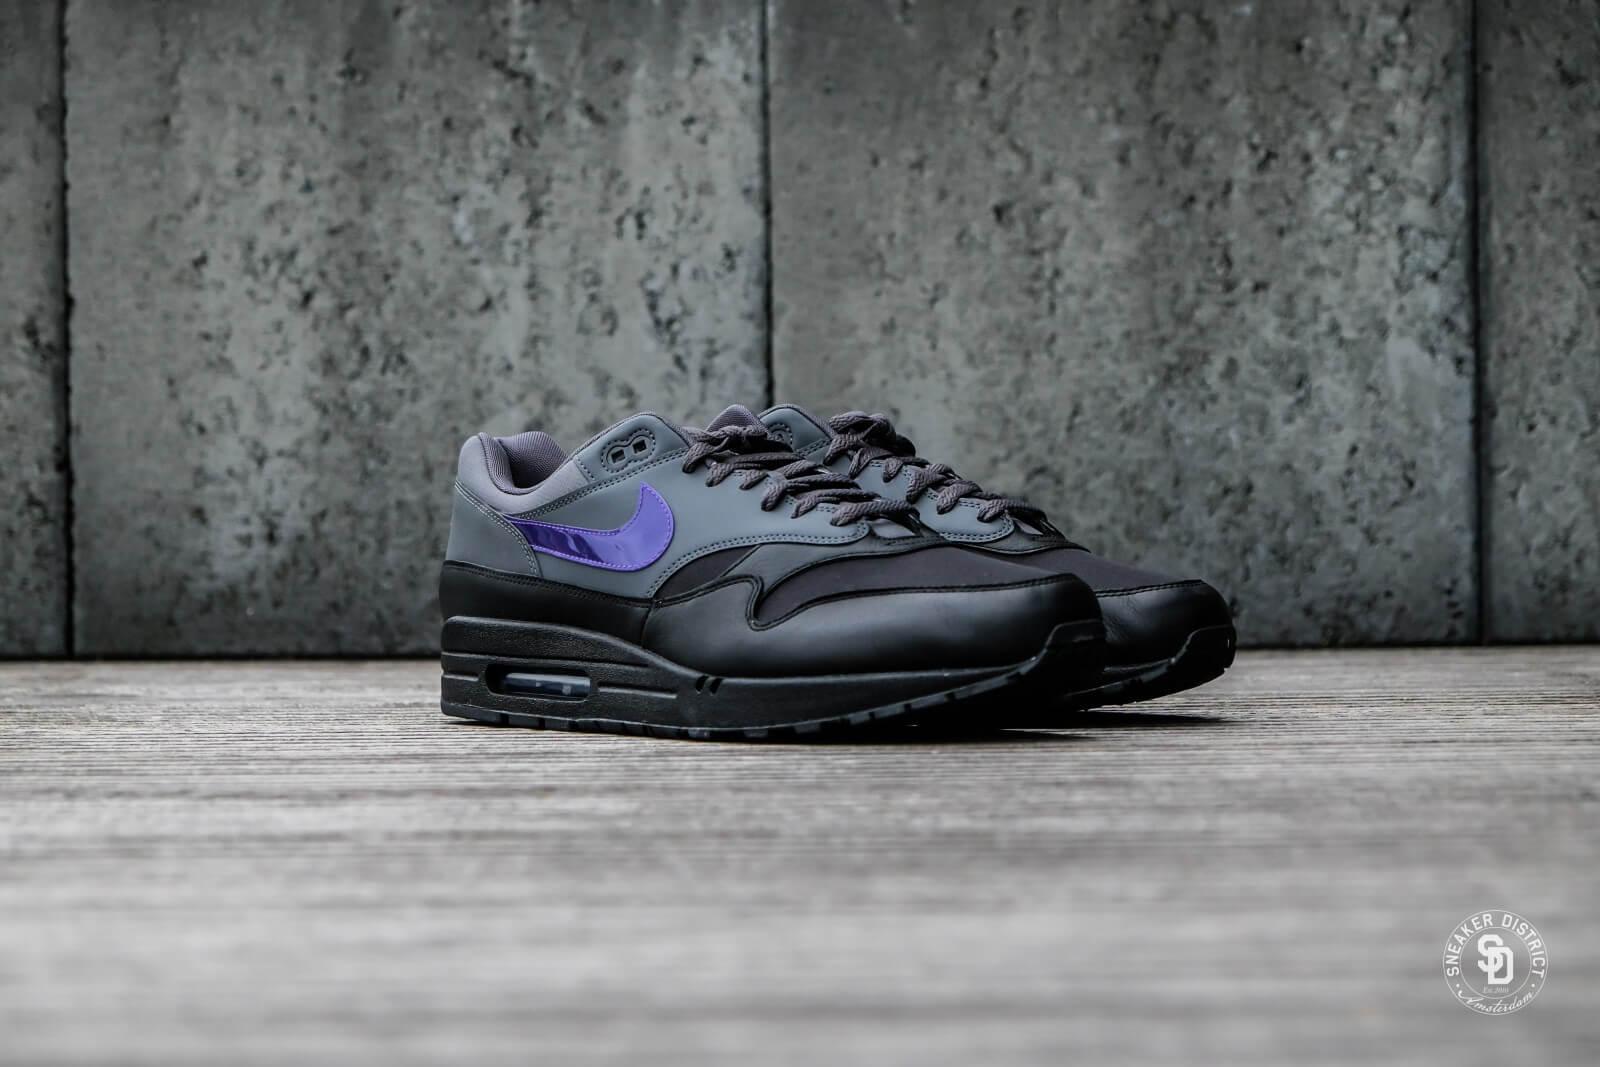 Nike Air Max 1 Dark GreyFierce Purple Black AR1249 002